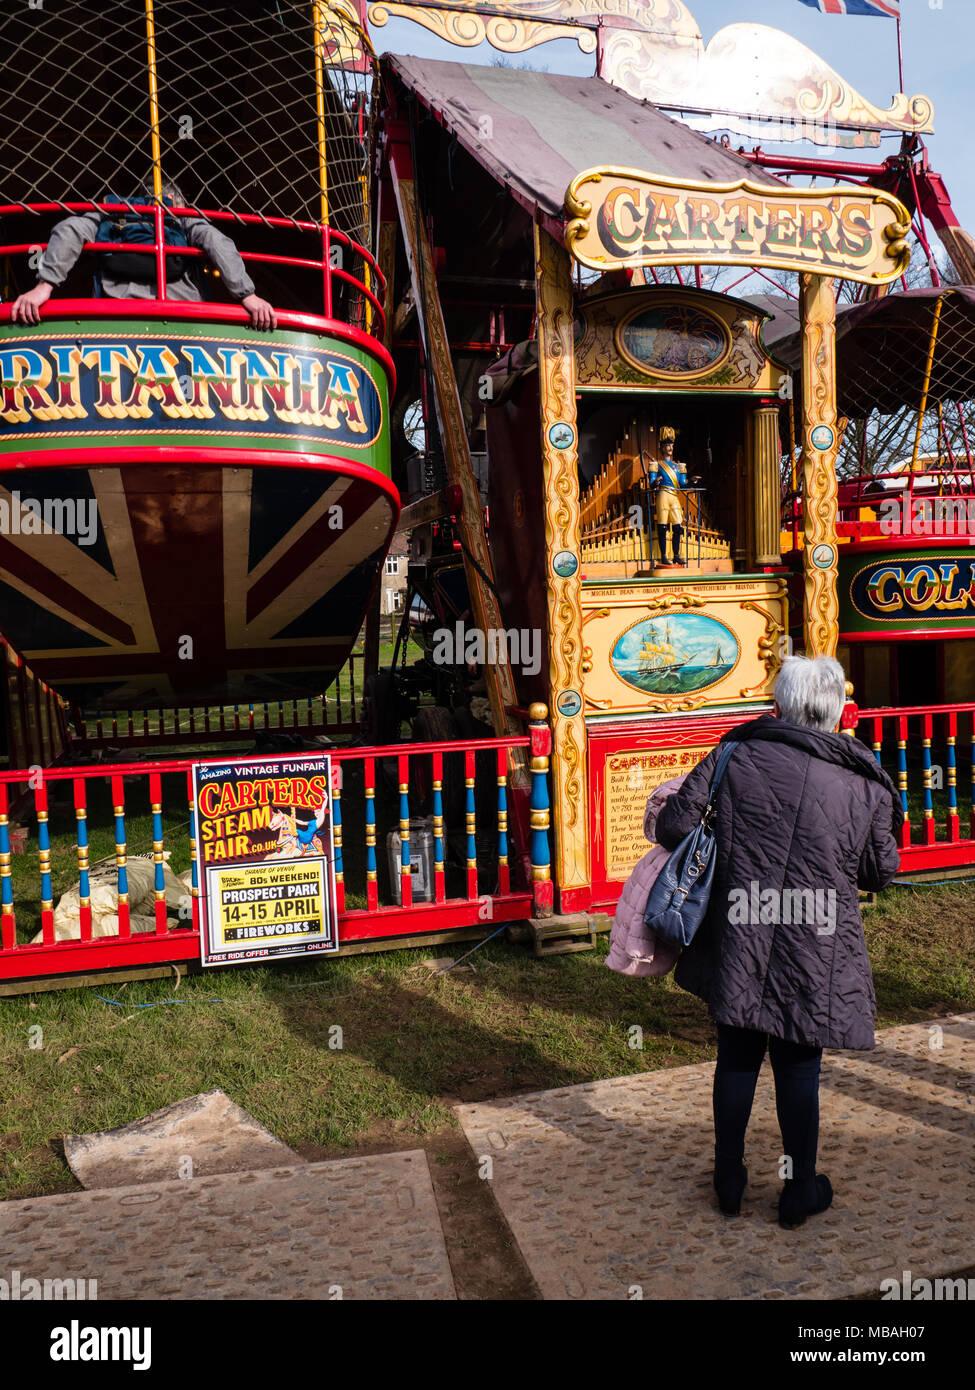 Steam Yachts Carters Steam Fair Prospect Park Tilehurst Reading